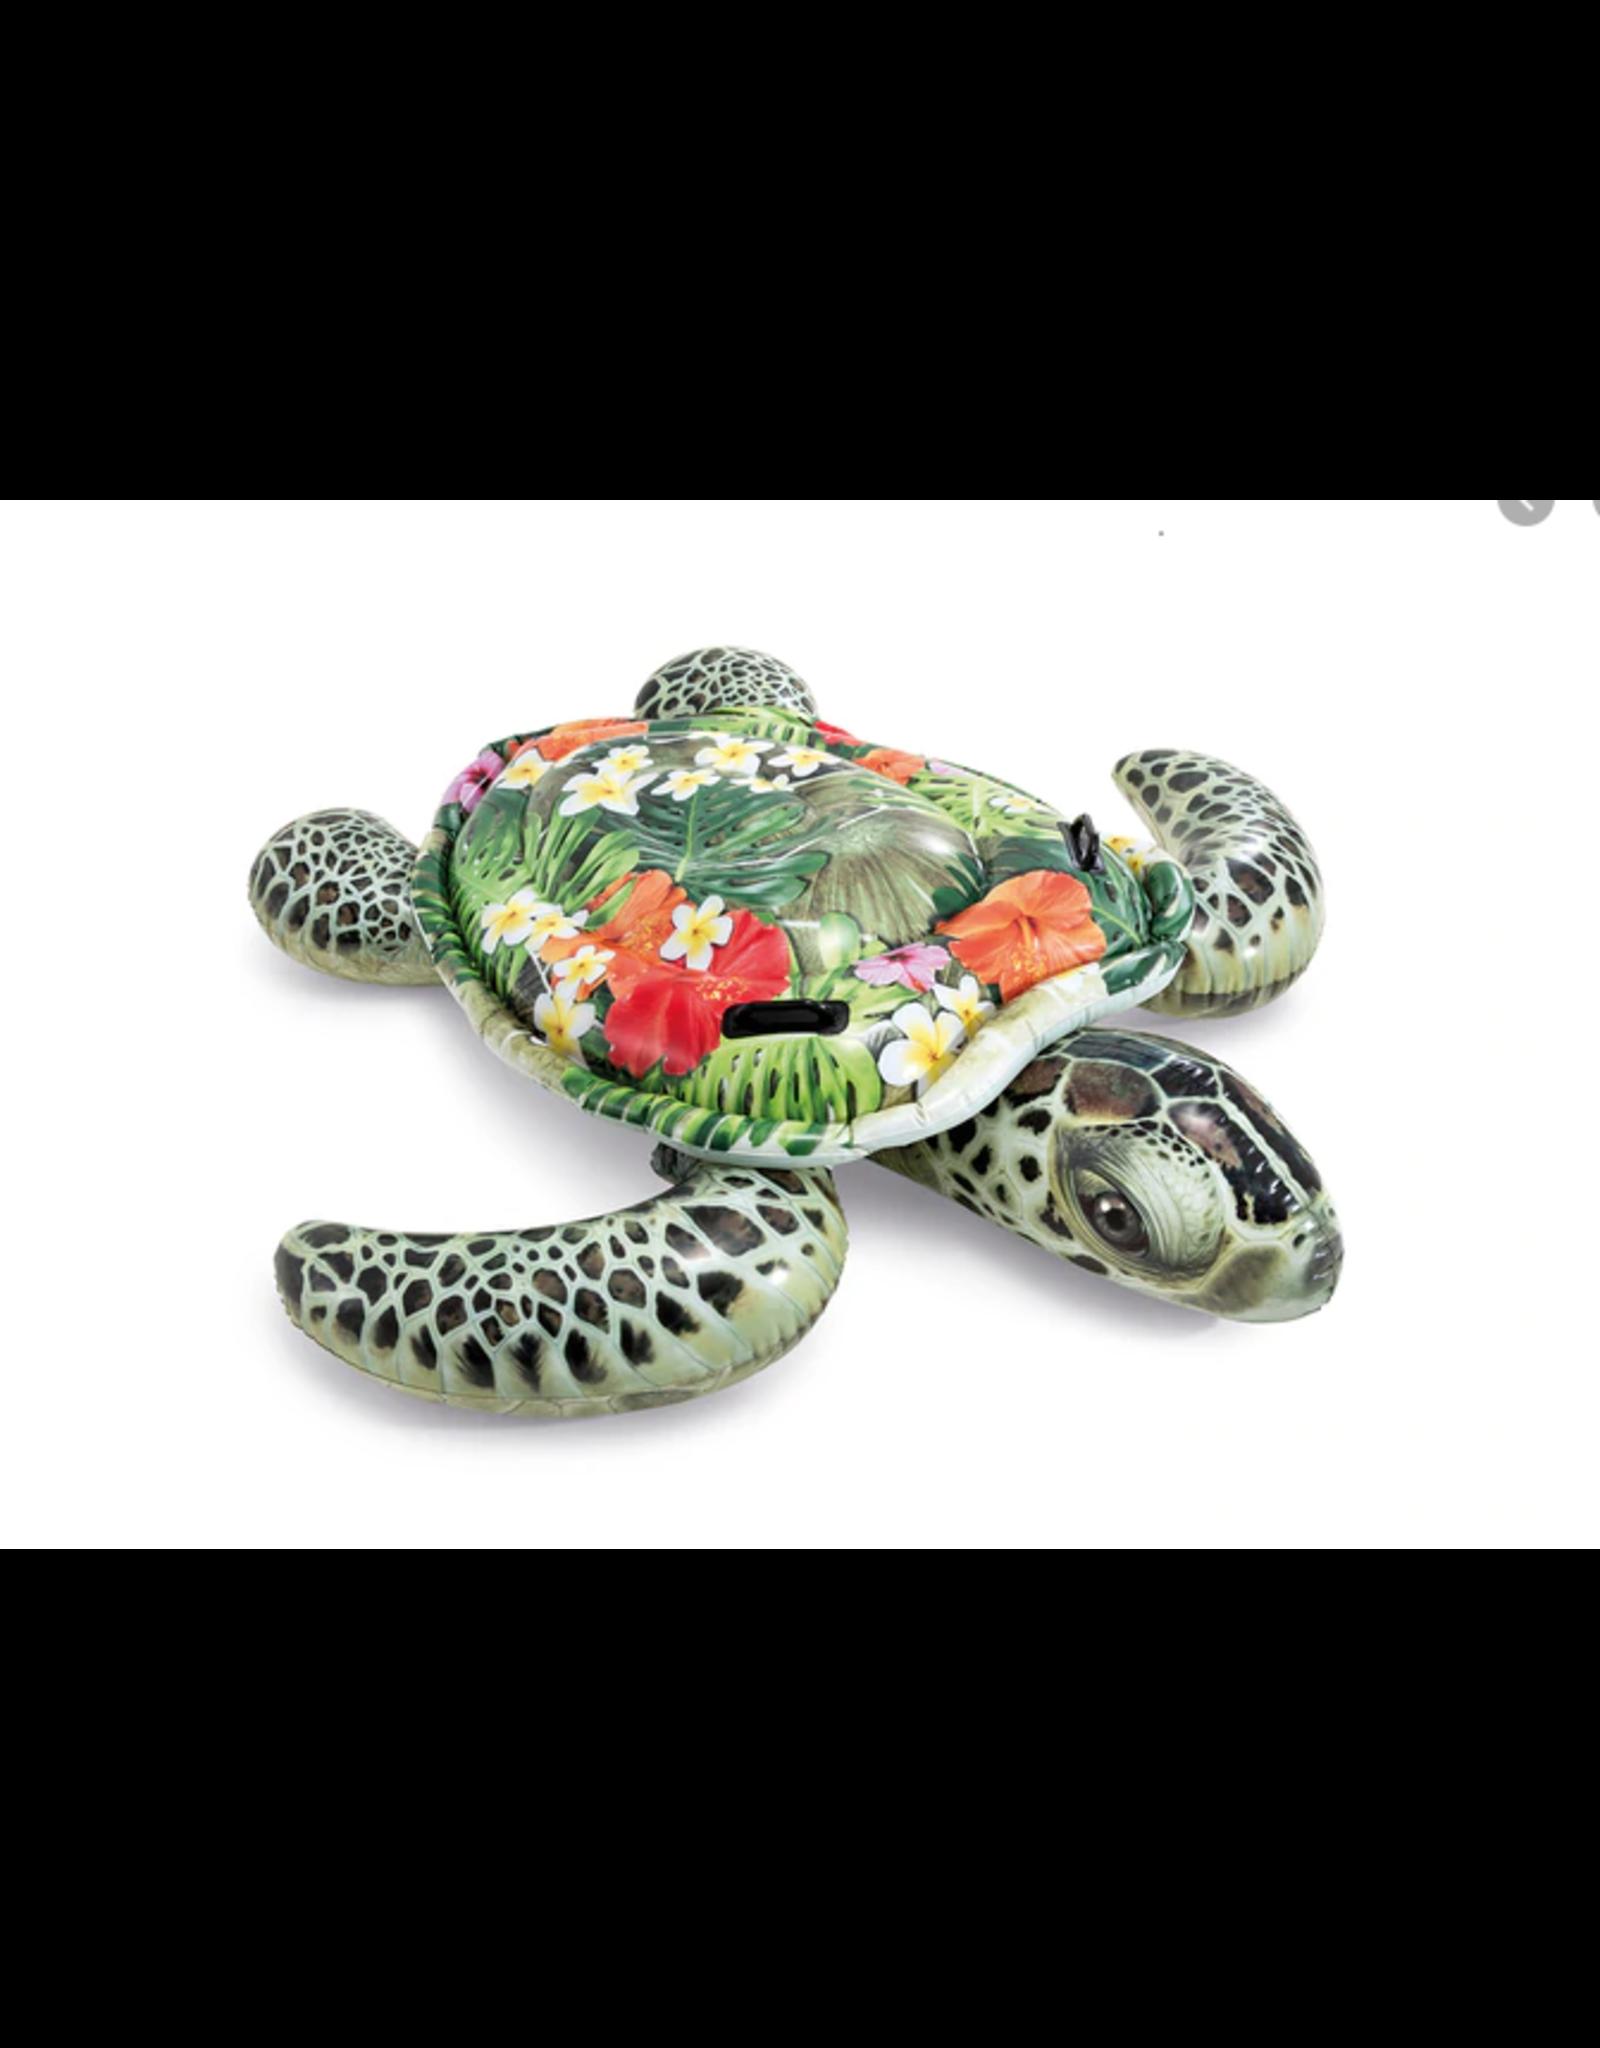 Intex Ride-On Tropical Turtle